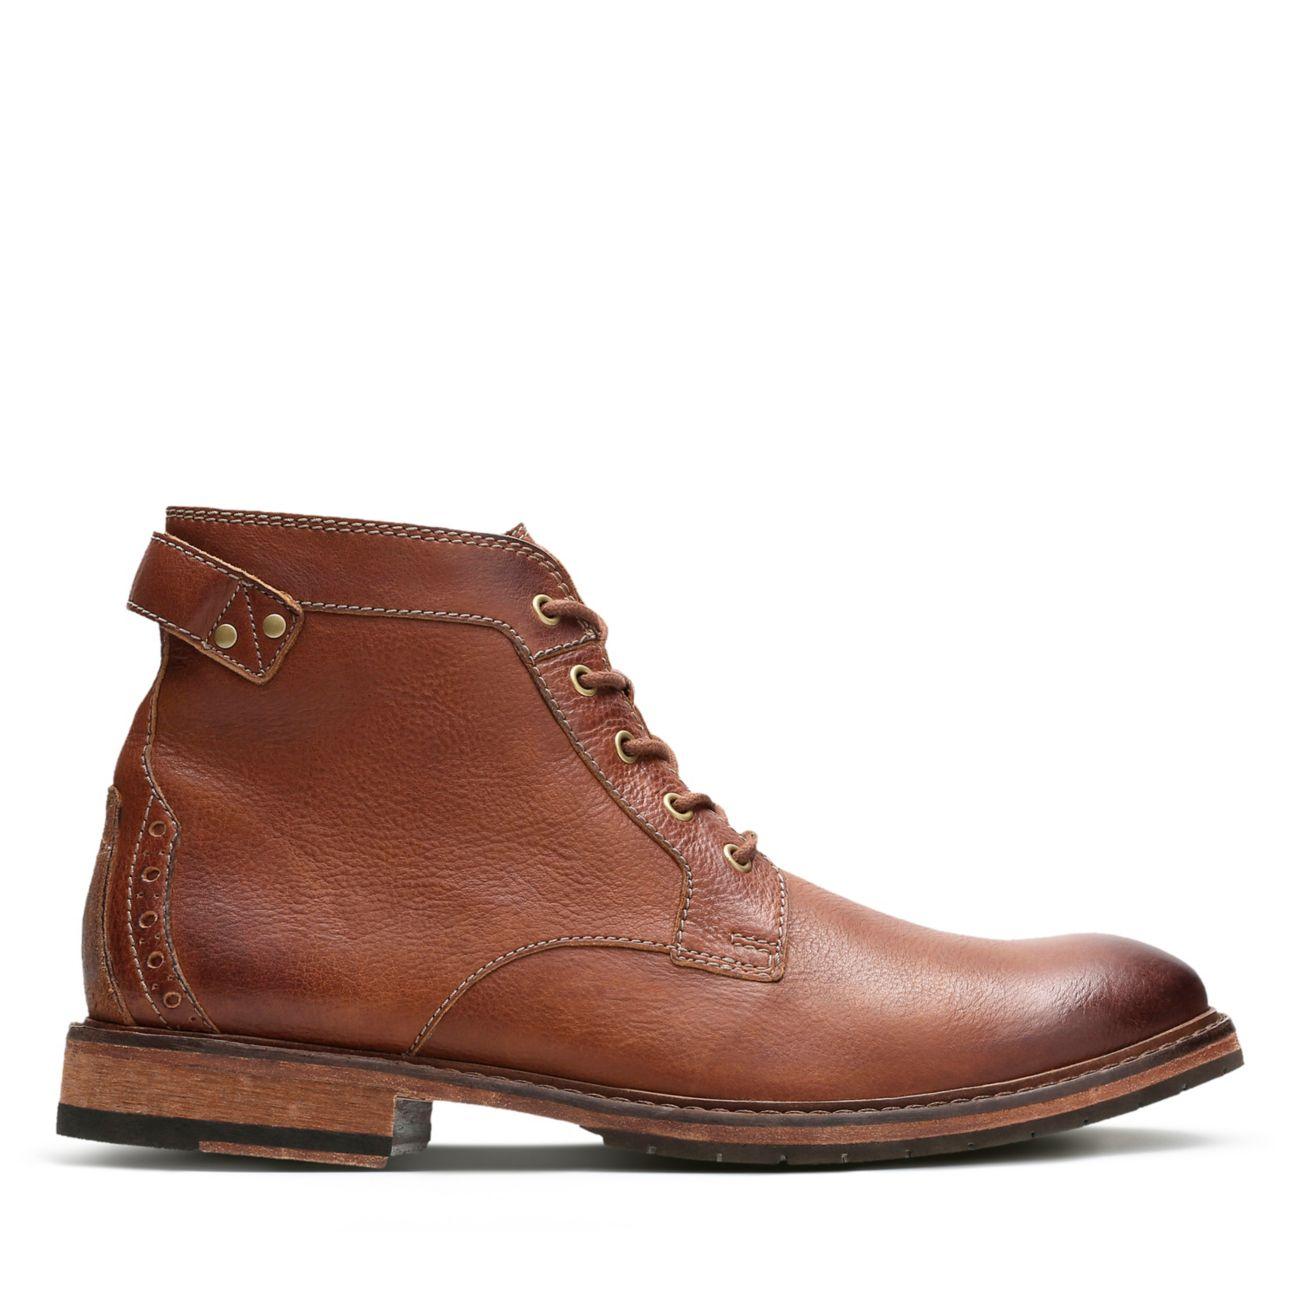 b59863f9516d9f Clarkdale Bud Cuir brun foncé | Clarks